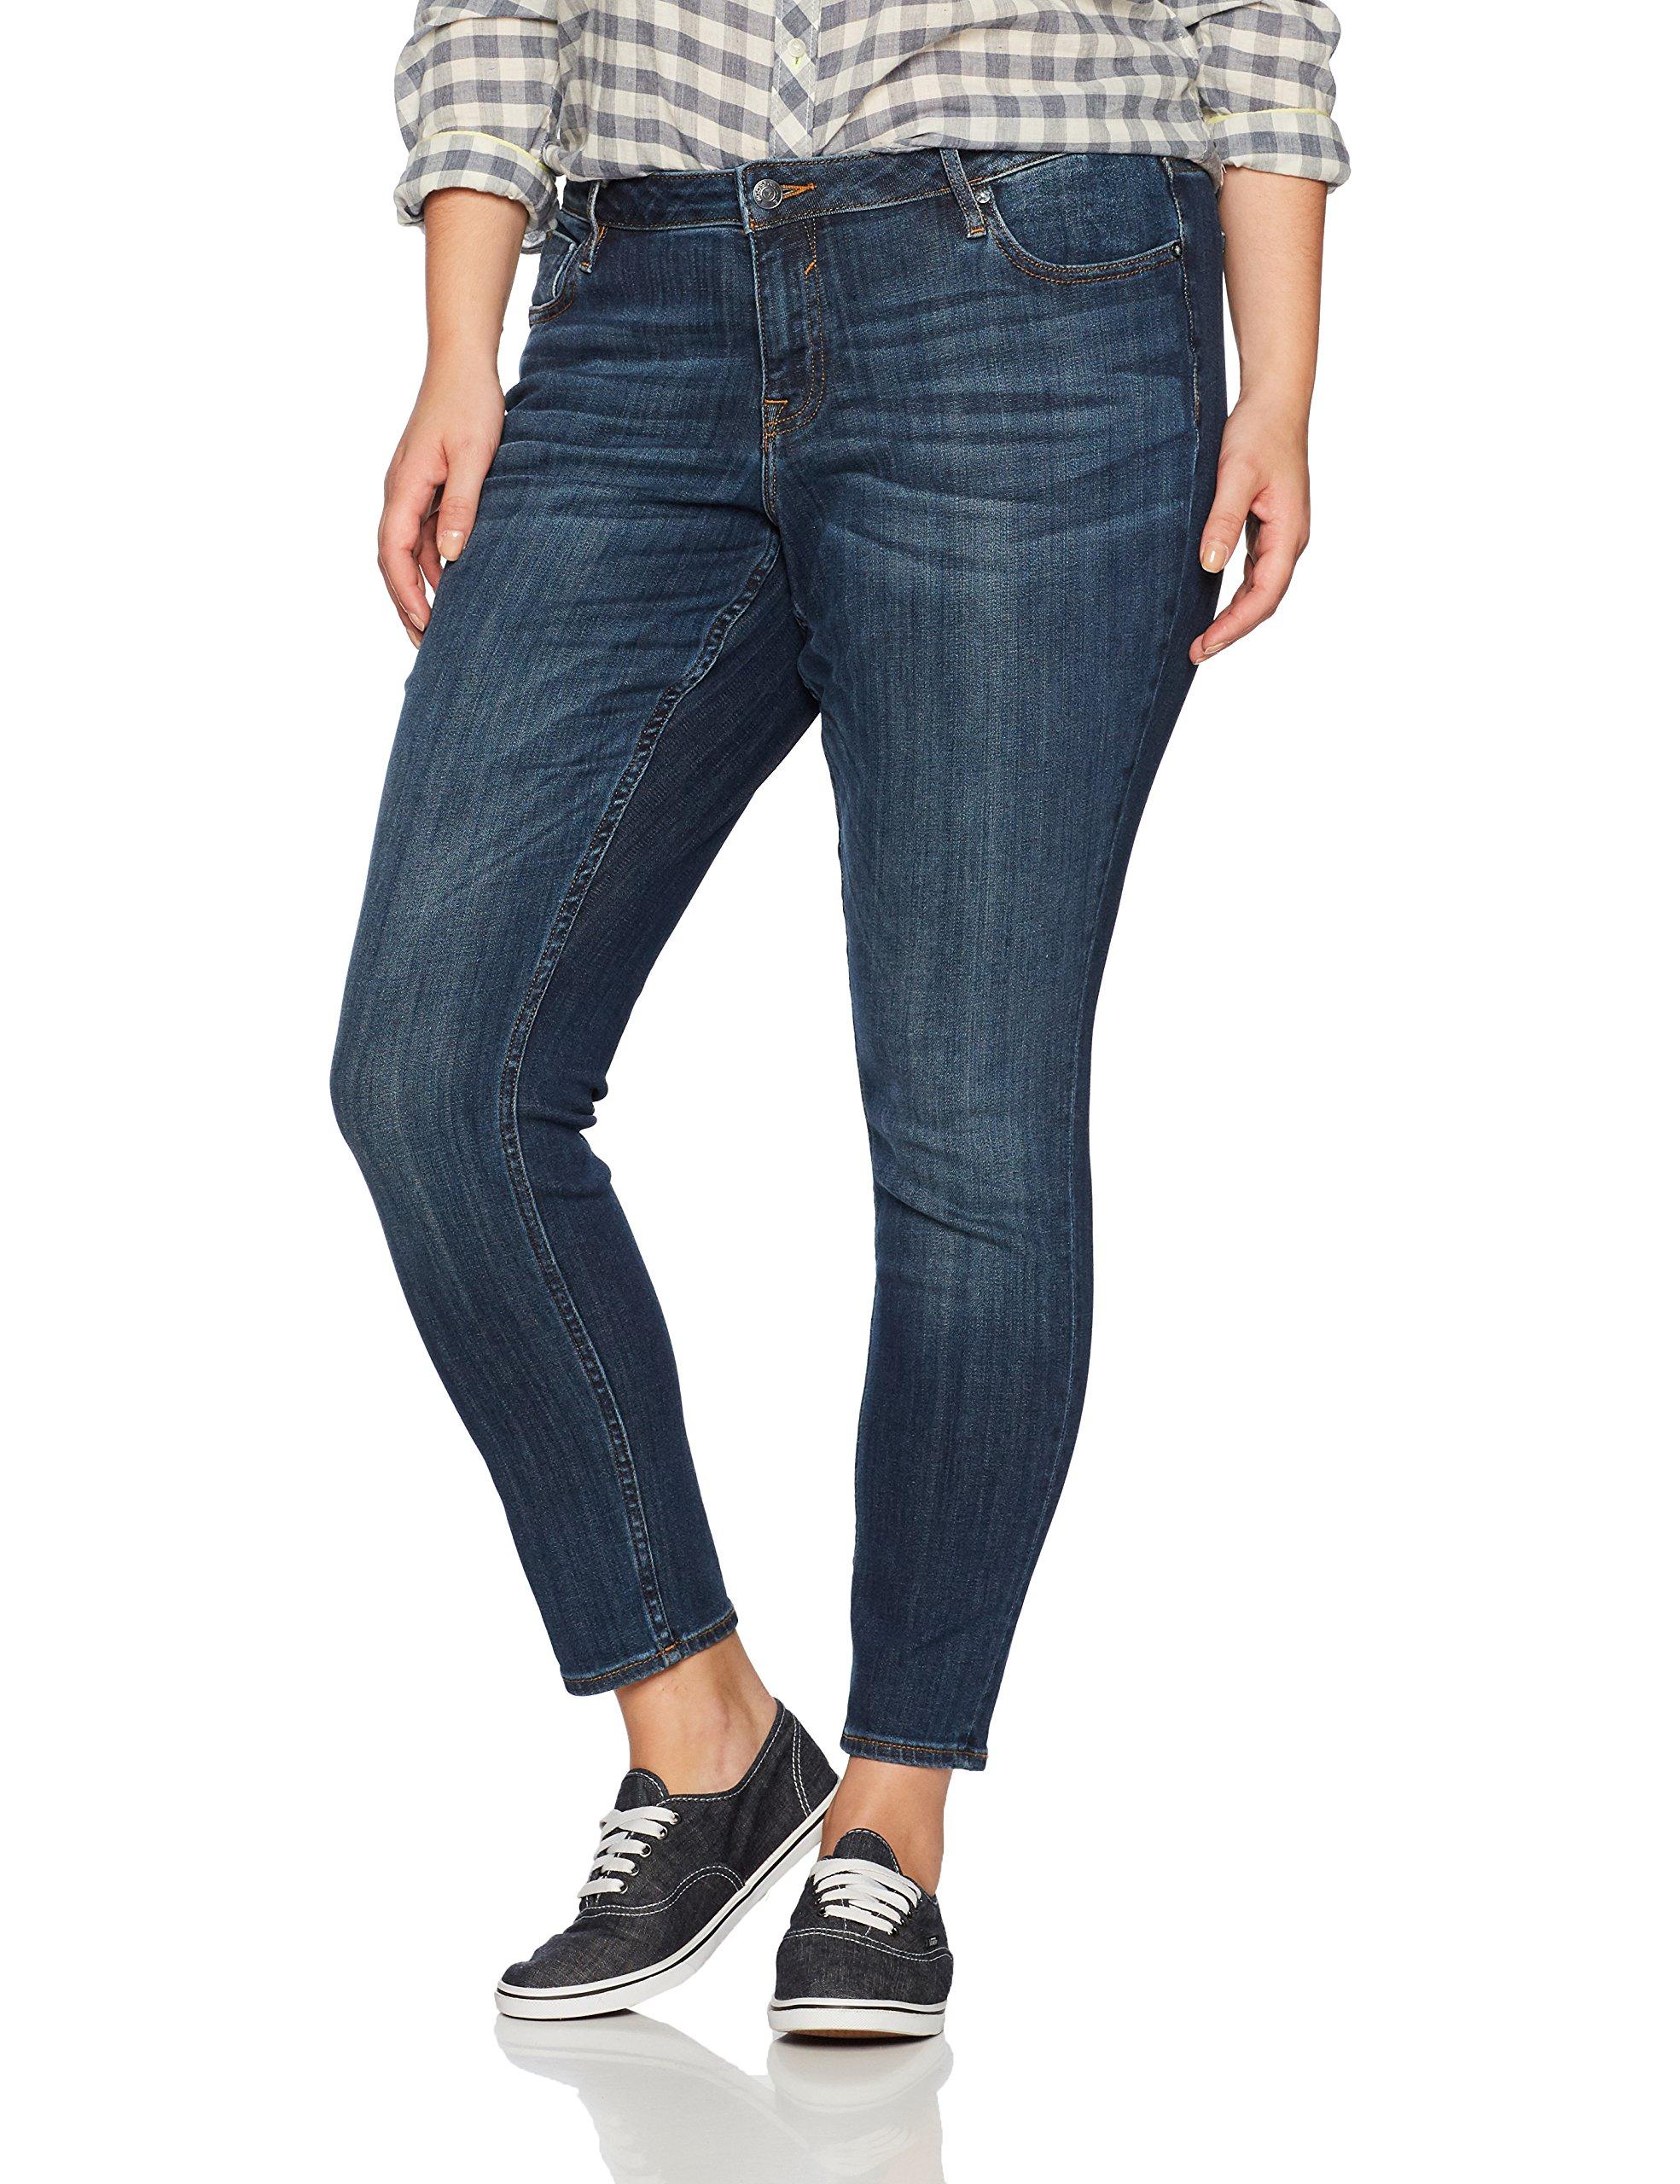 Vigoss Women's Plus Size Jagger Classic Fit Skinny Jean, Clean Dark, 22